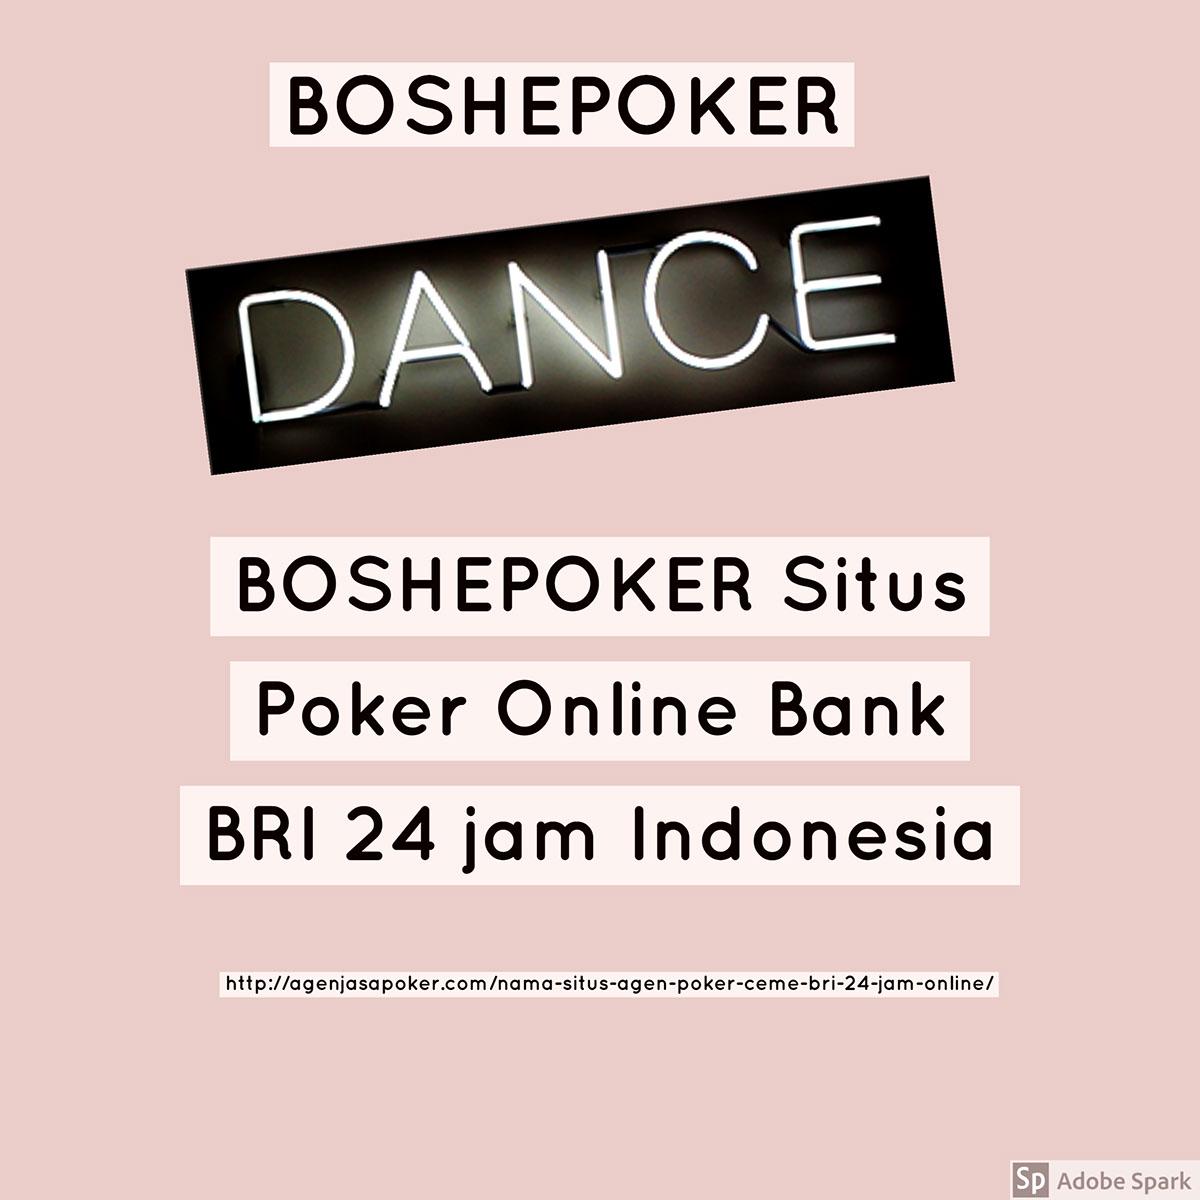 BOSHEPOKER BOSHEPOKER<P>BOSHEPOKER Situs Poker Online Bank BRI 24 jam Indonesia<P>http://agenjasapoker.com/nama-situs-agen-poker-ceme-bri-24-jam-online/